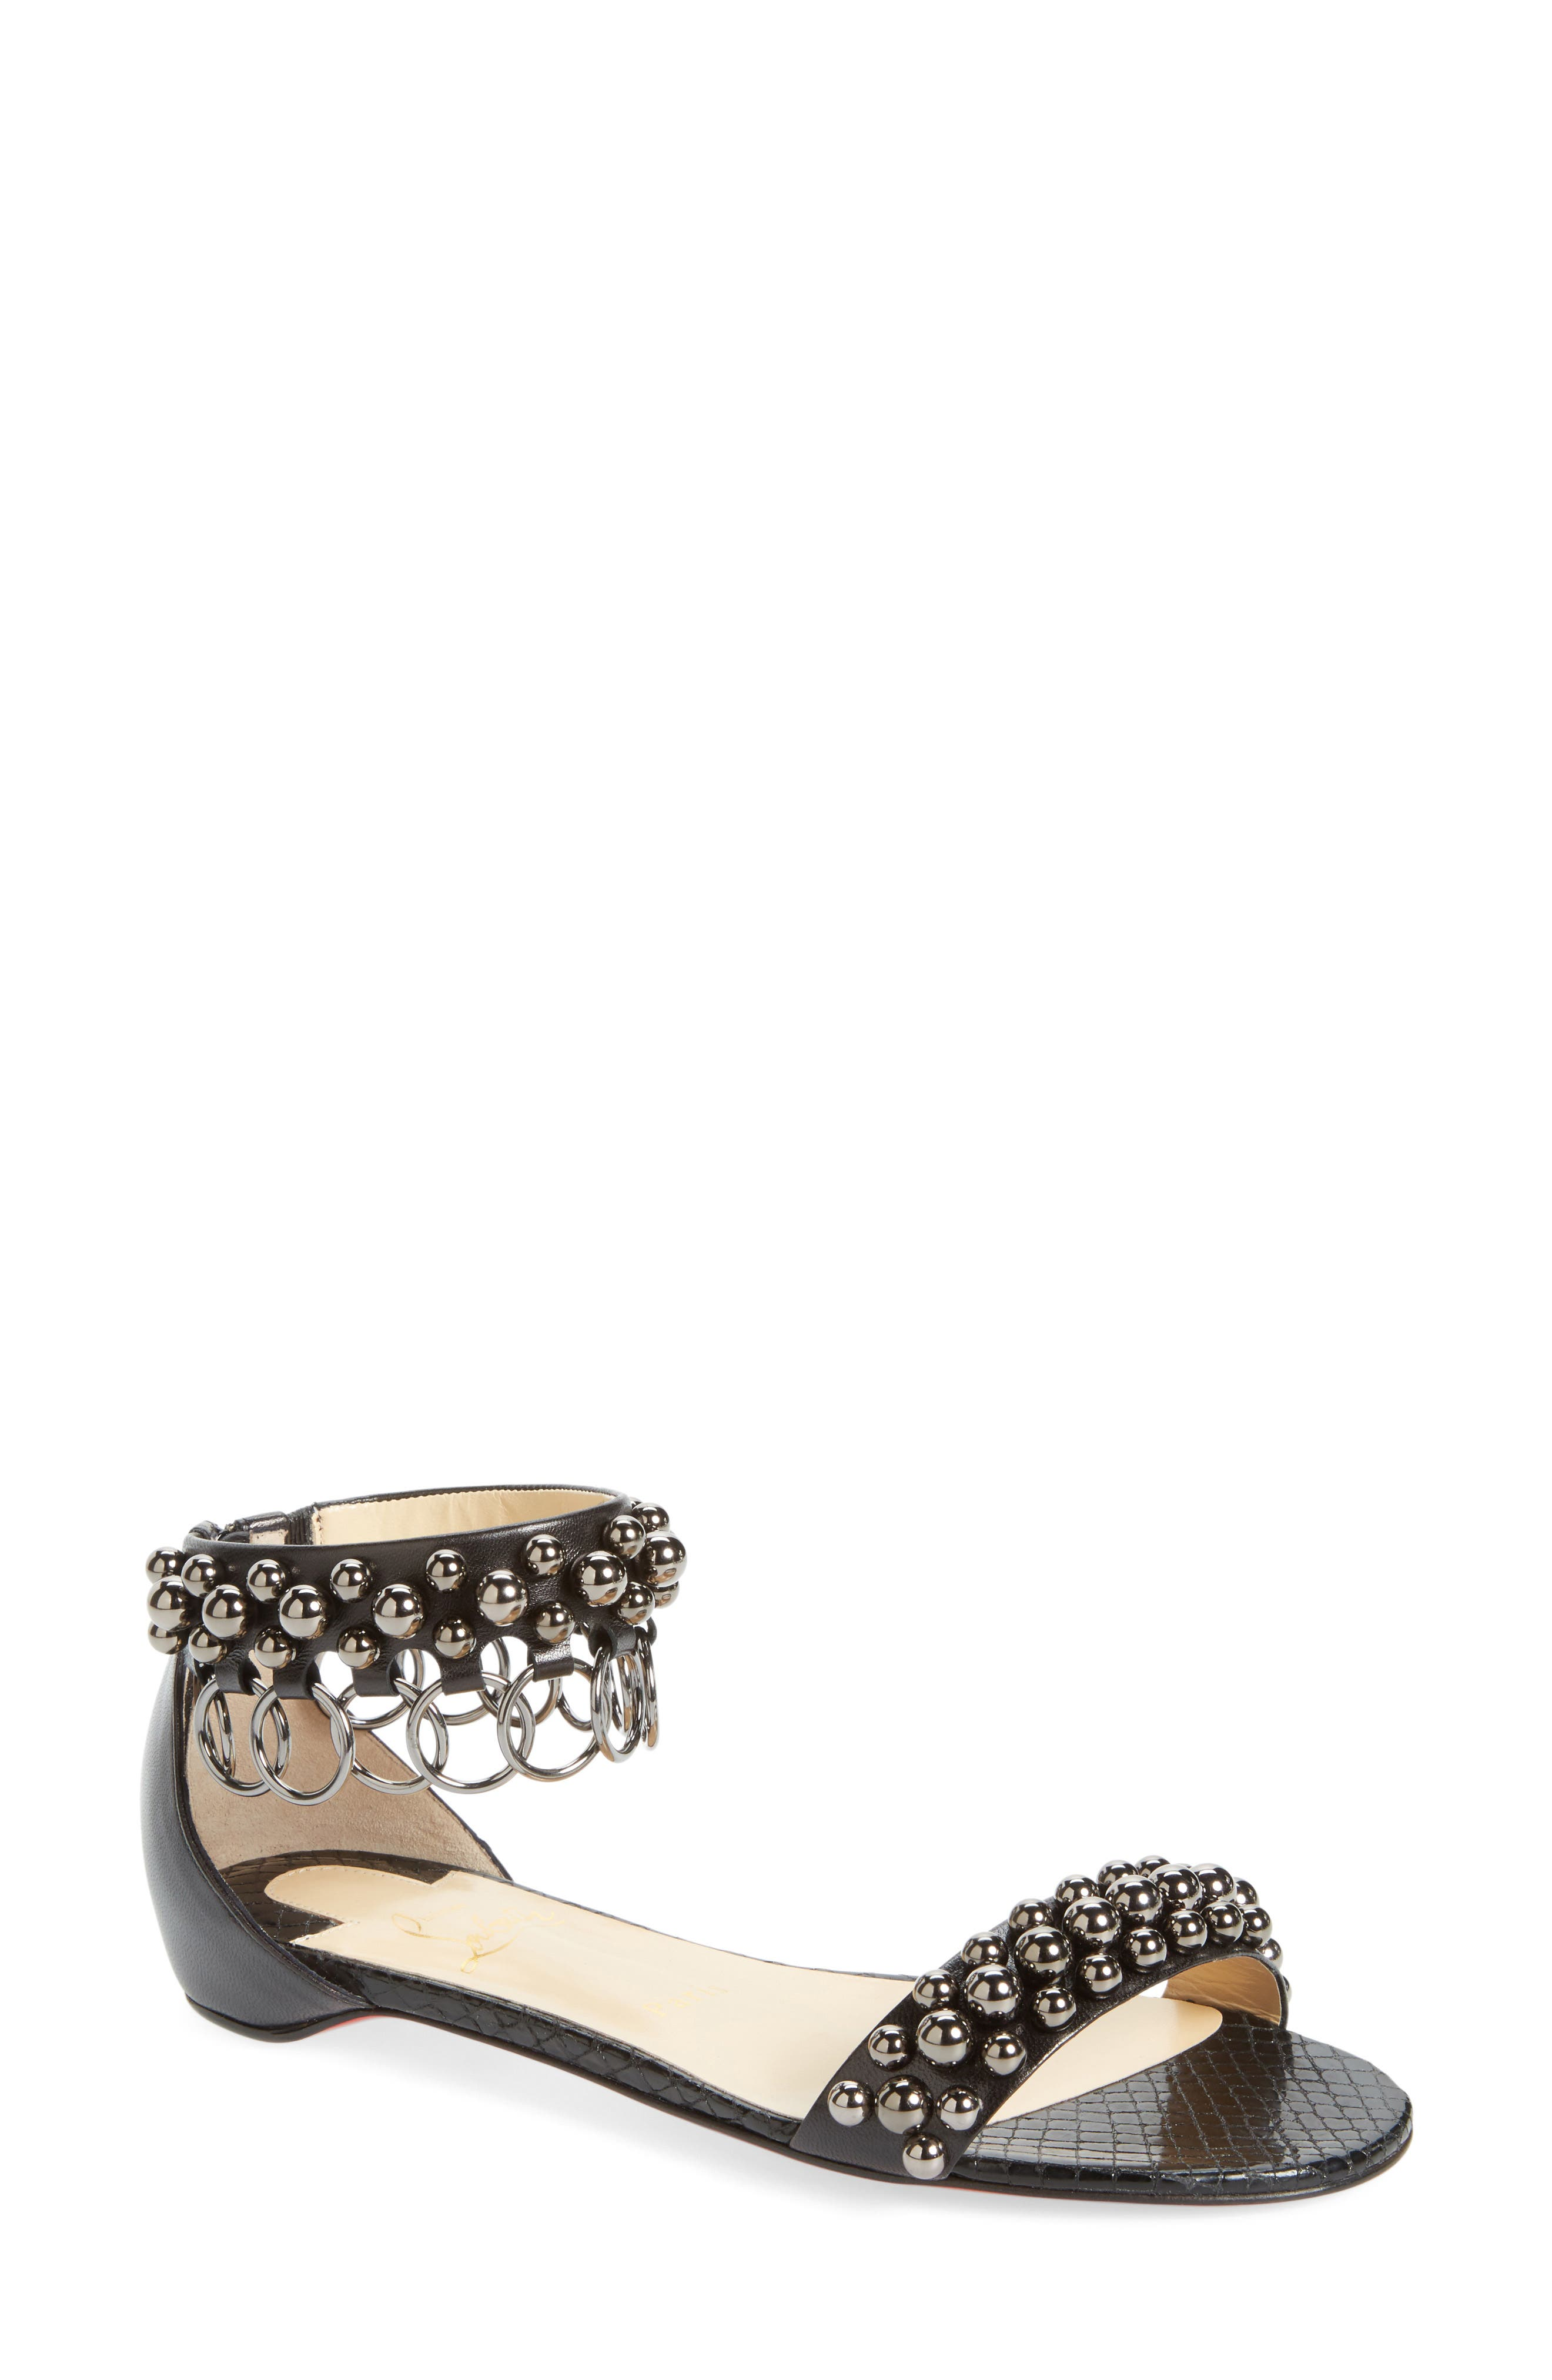 Main Image - Christian Louboutin Gypso Ringlet Sandal